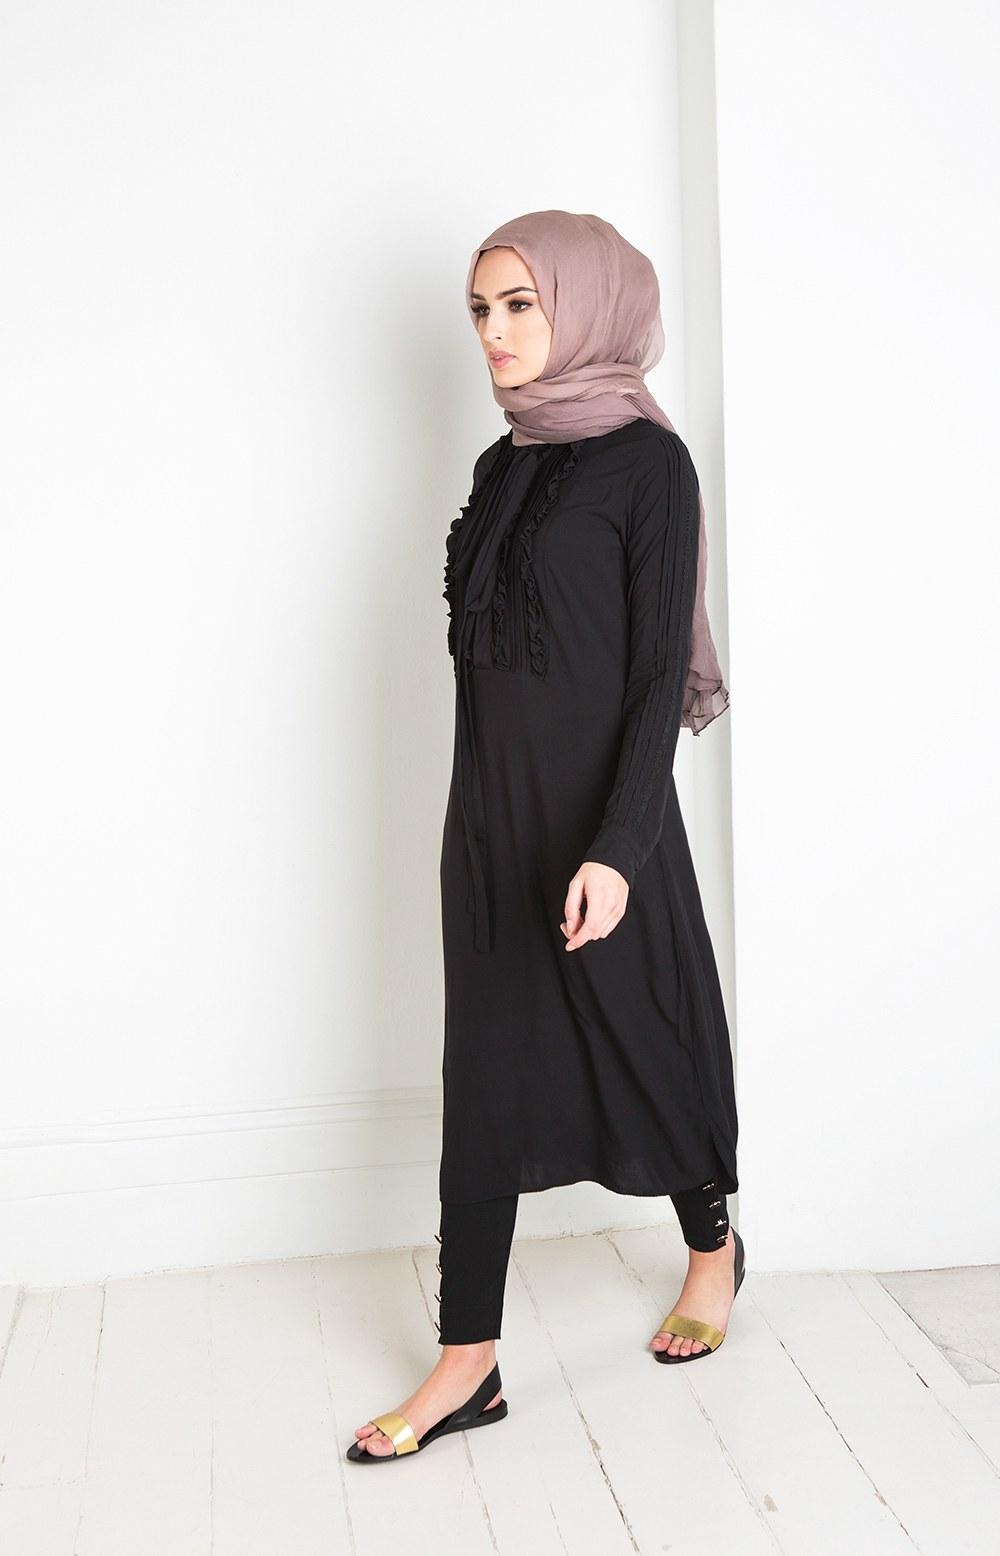 Model Baju Lebaran Simple Drdp 25 Trend Model Baju Muslim Lebaran 2018 Simple & Modis